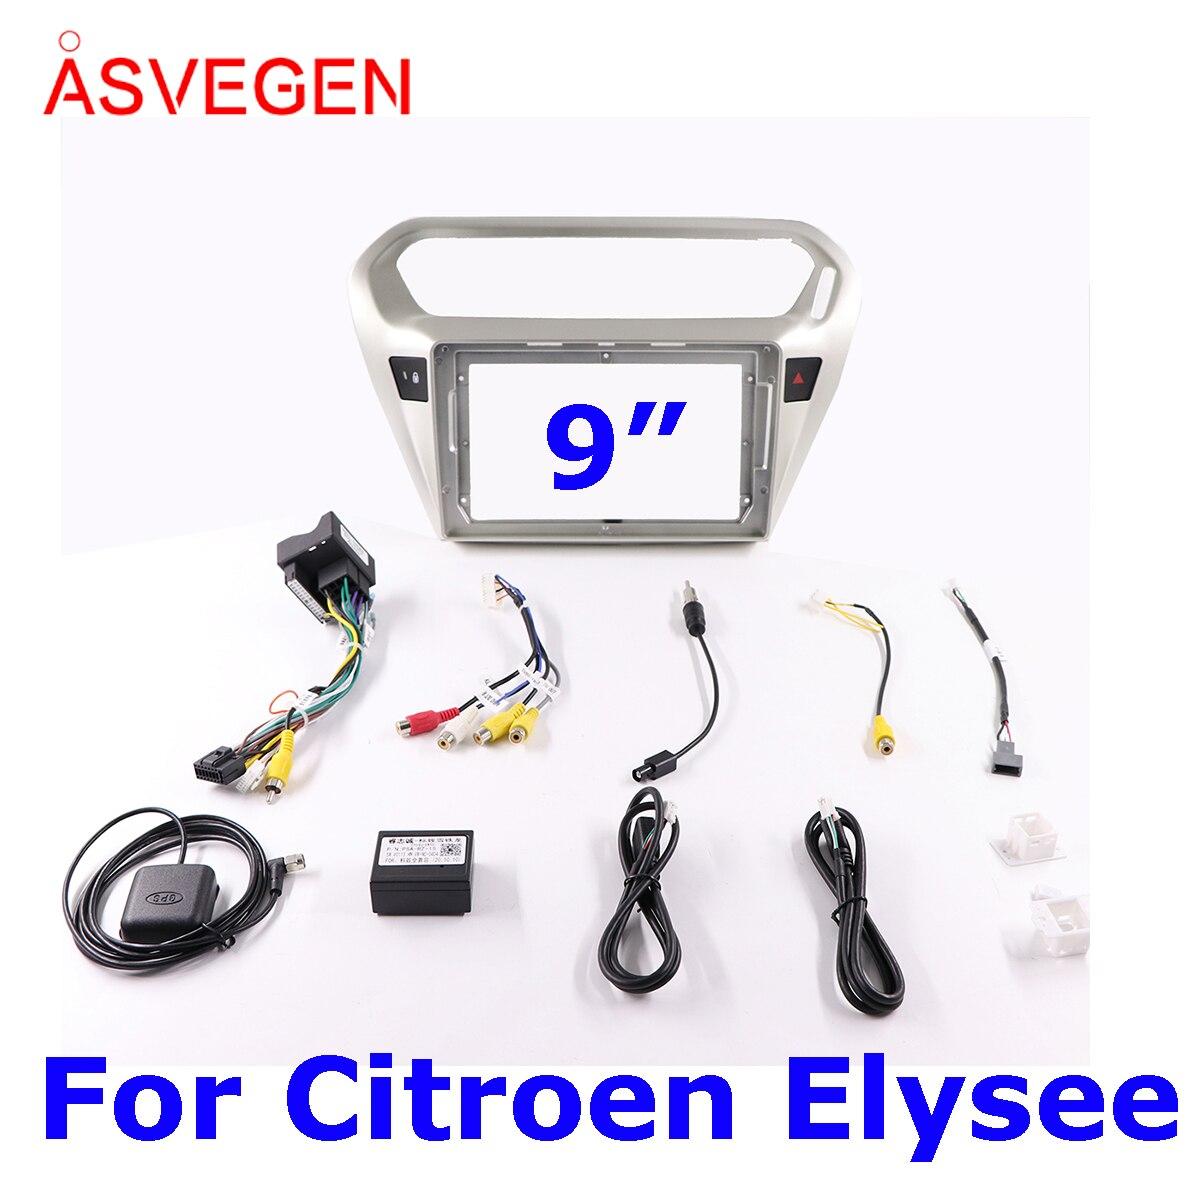 Asvegen Car Radio Fascia Frame For Citroen Elysee Car Dvd Frame Install Panel Dash Mount Installation Dashboard